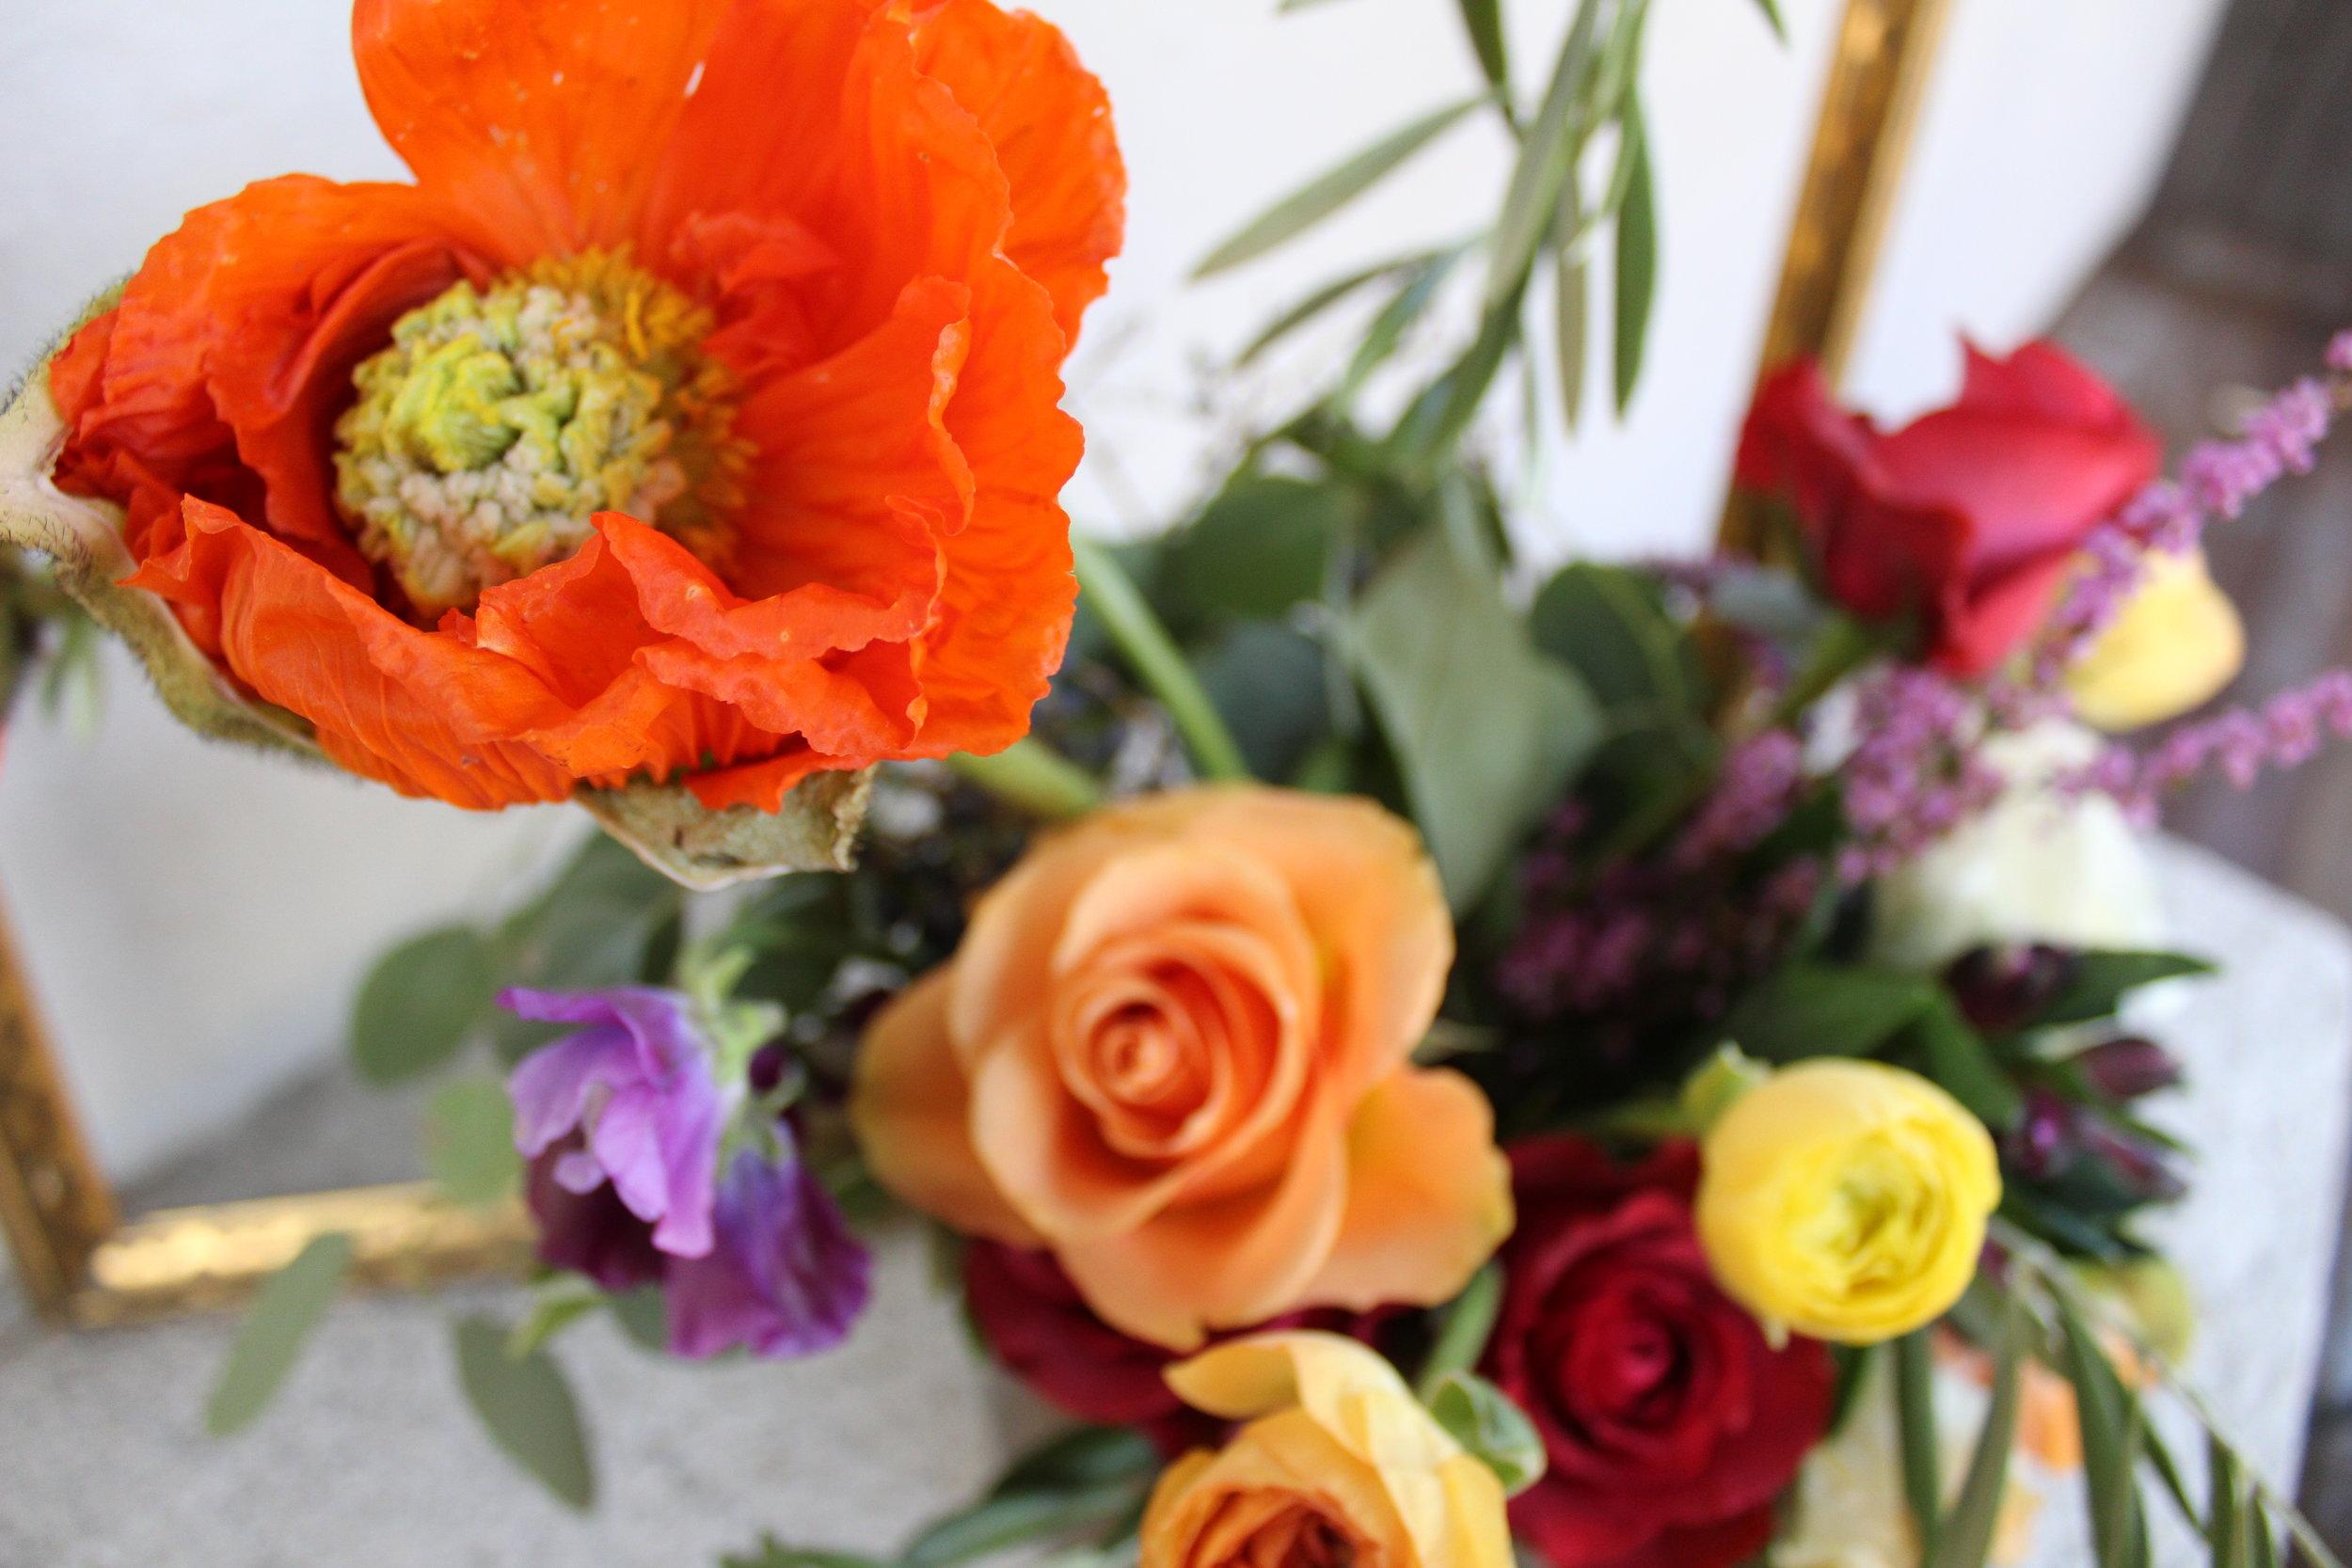 Boho-wedding-table-floral-decor-ideas-by-bowerbird-flowers-durham-wedding-florist-jamie-blow.jpg